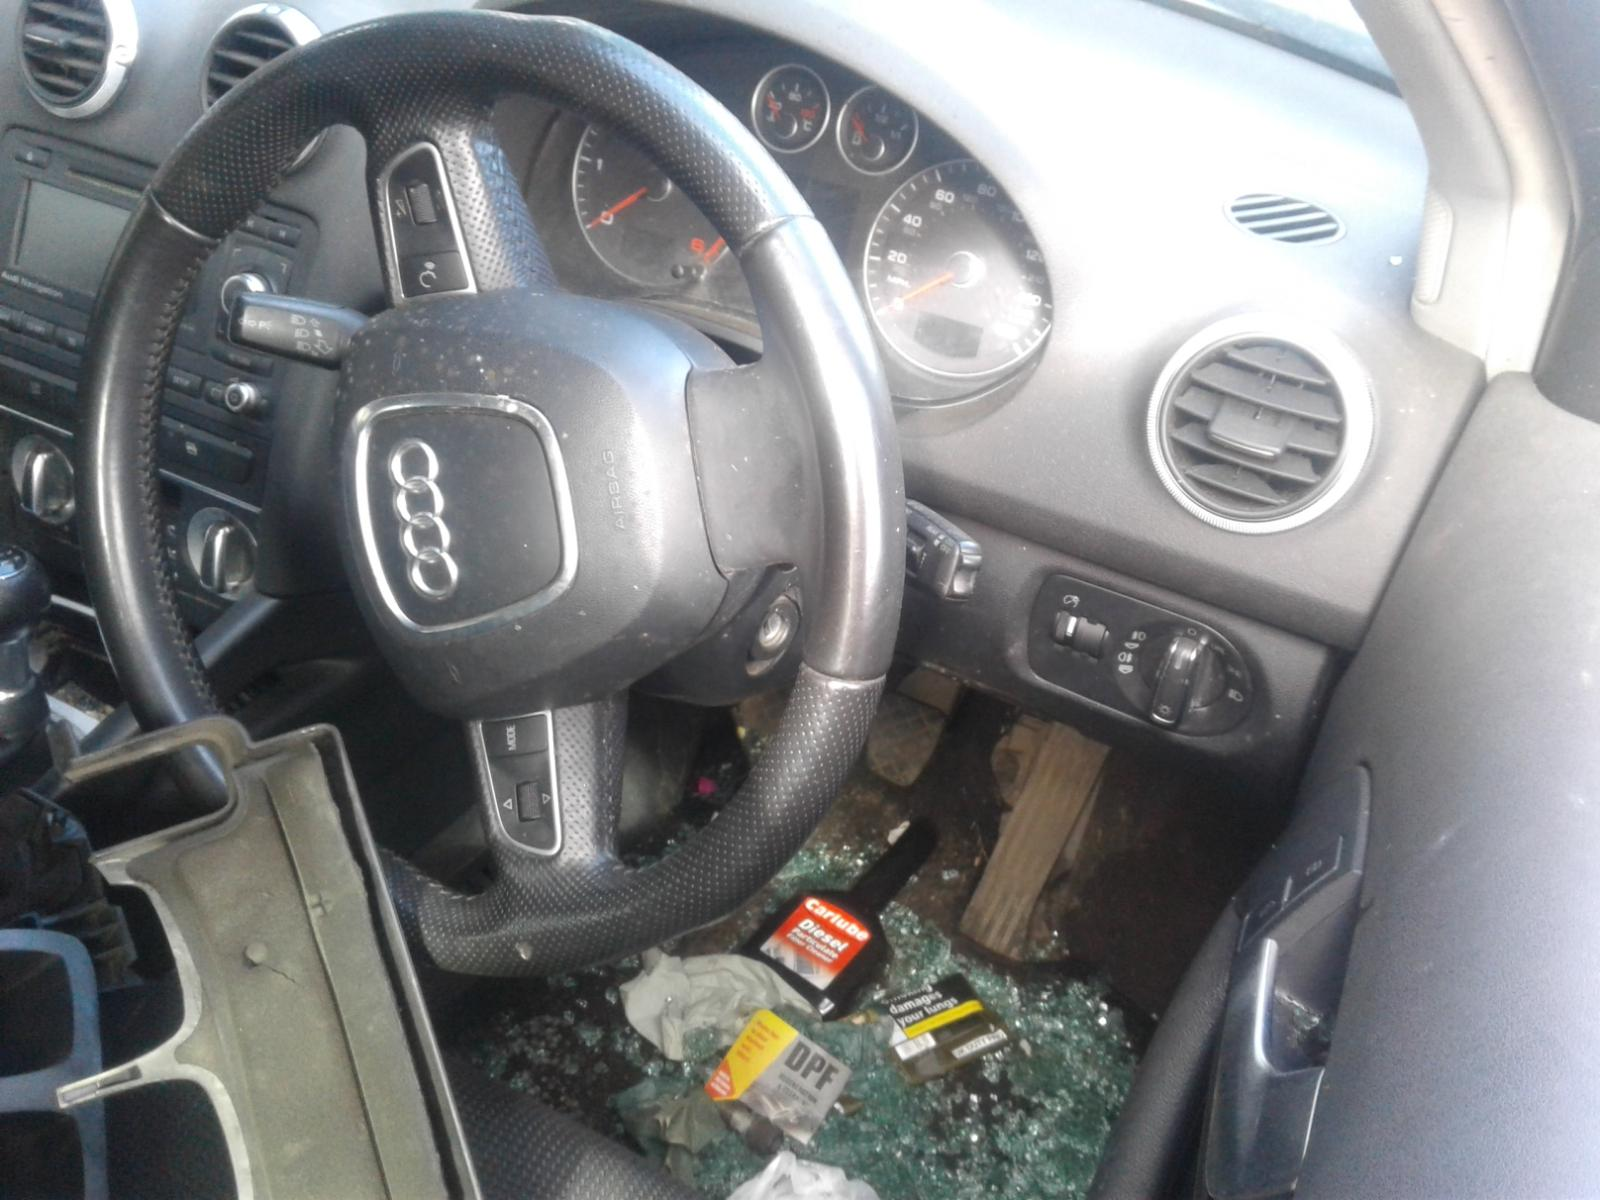 View Auto part AUDI A3 2009 5 Door Hatchback